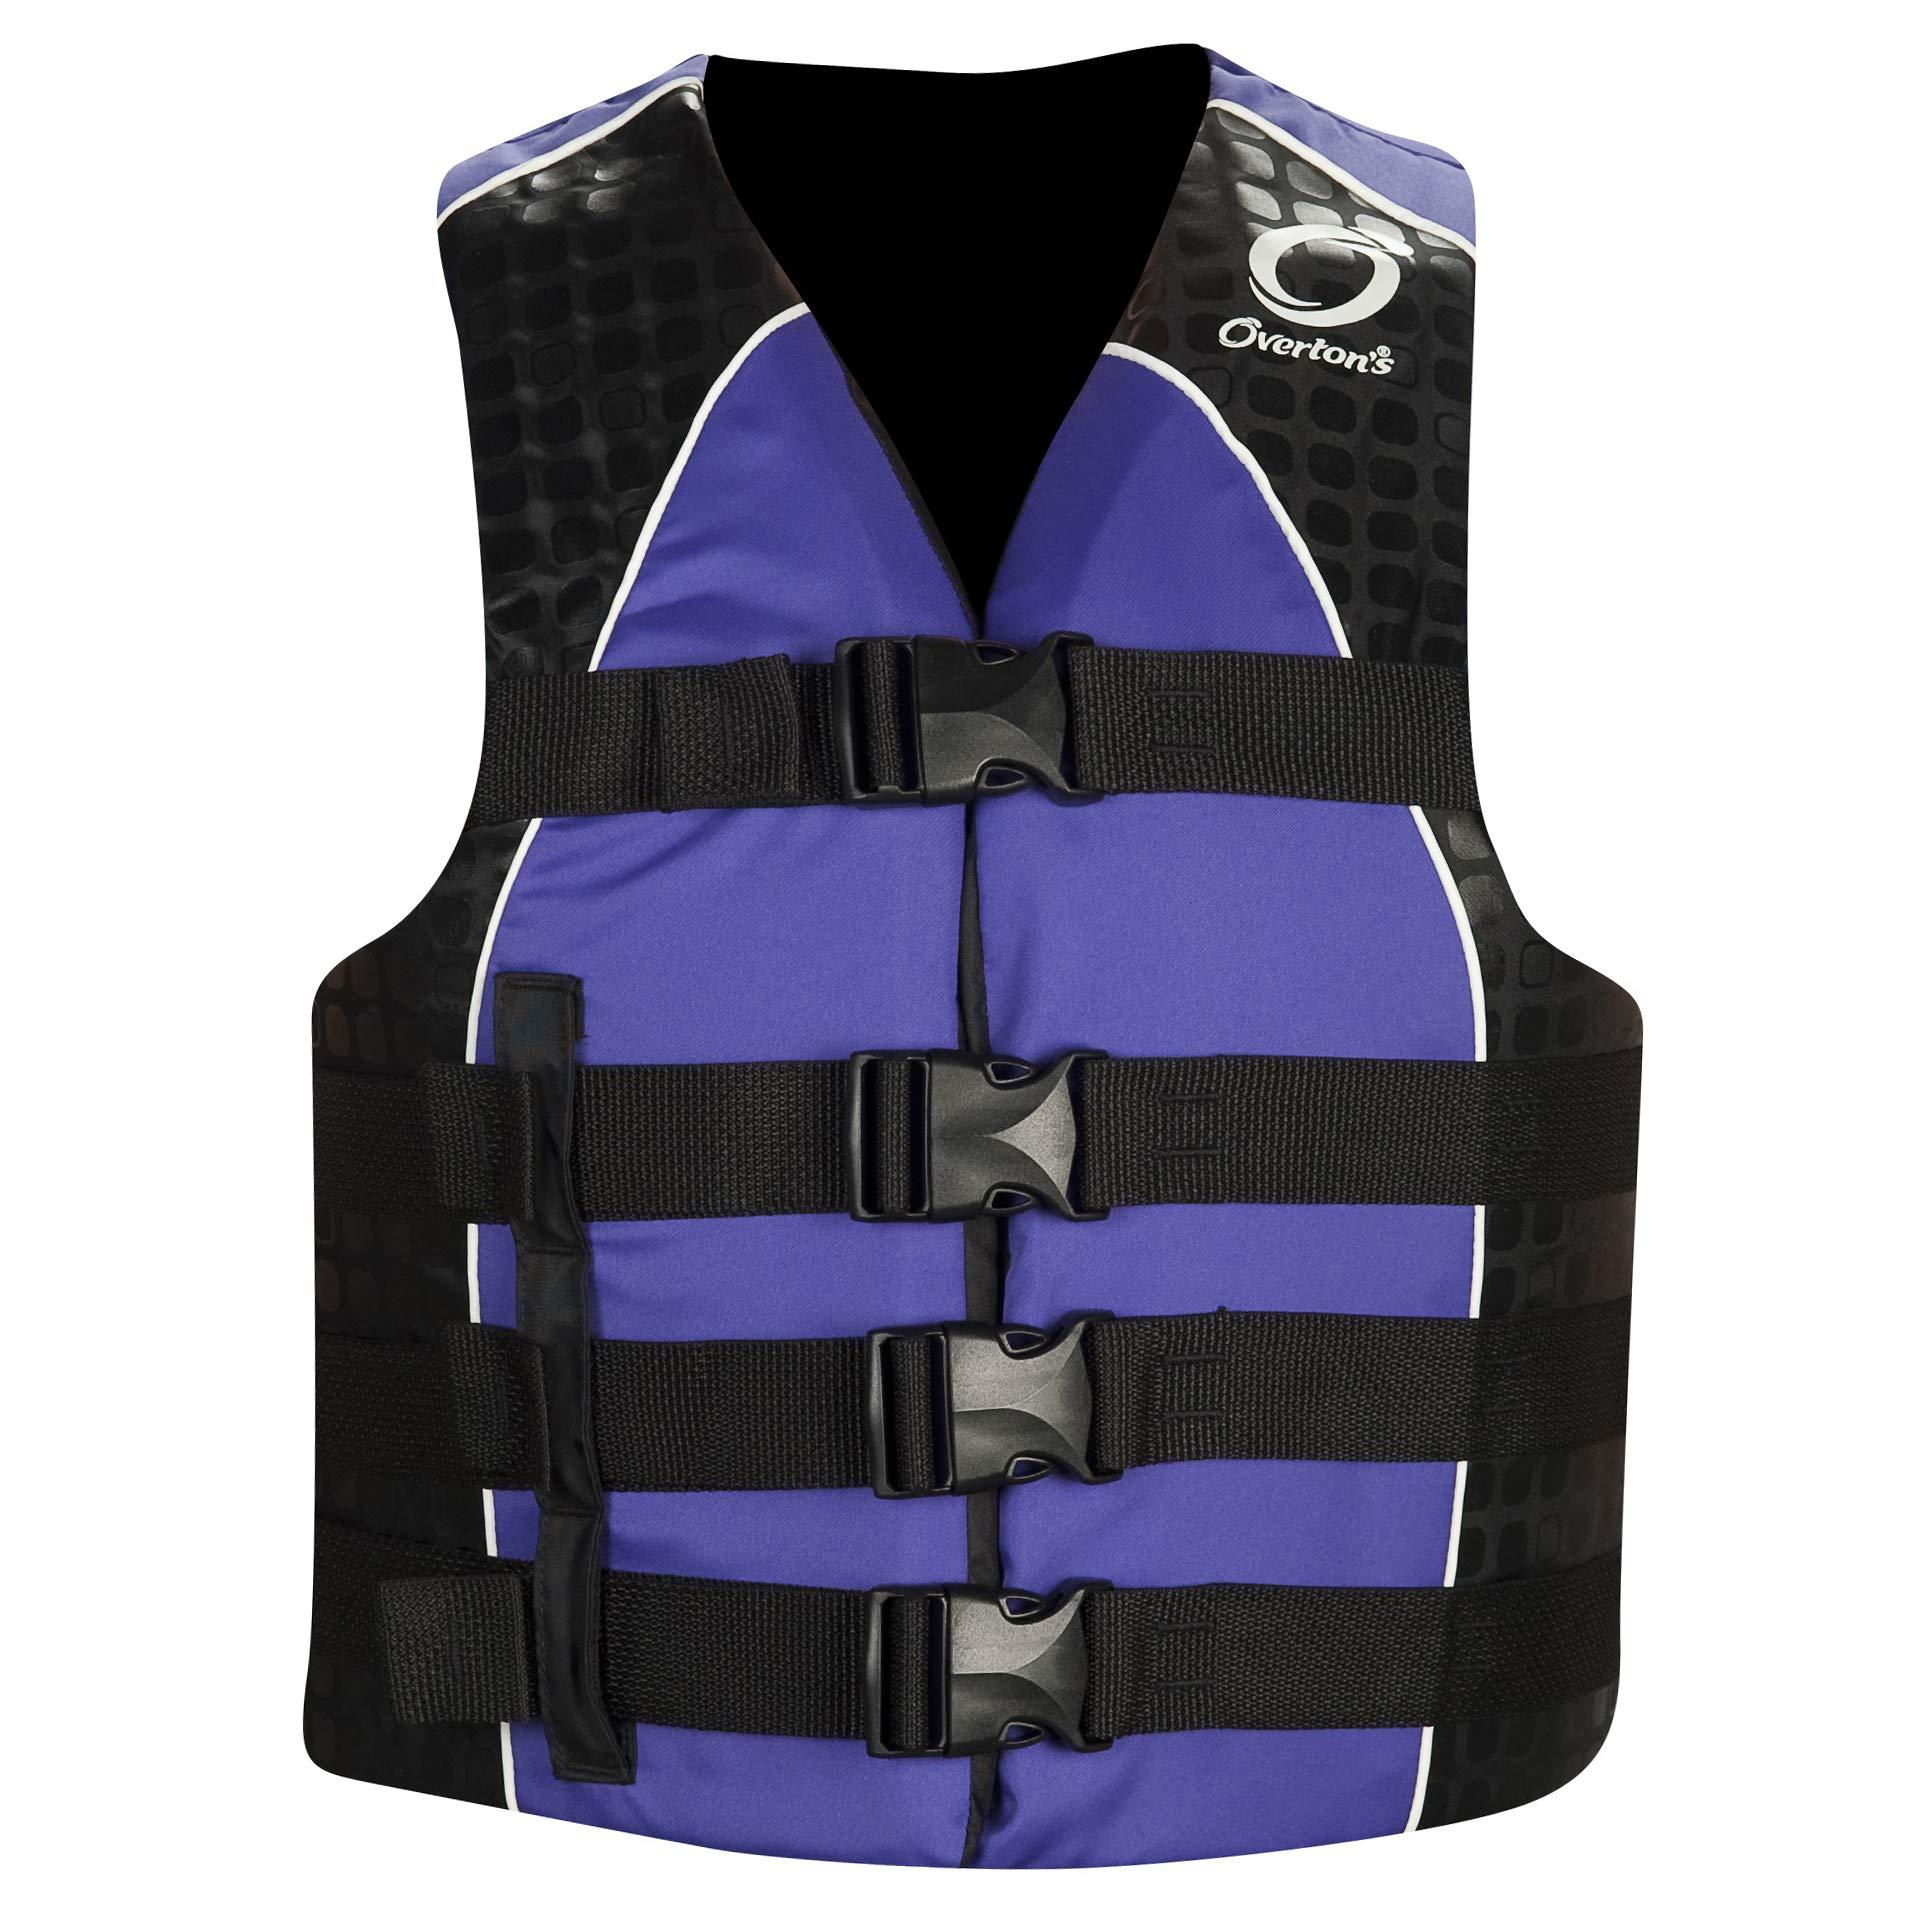 Overton's Women's Nylon 4-Buckle Life Vest Purple (S/M) by Overton's